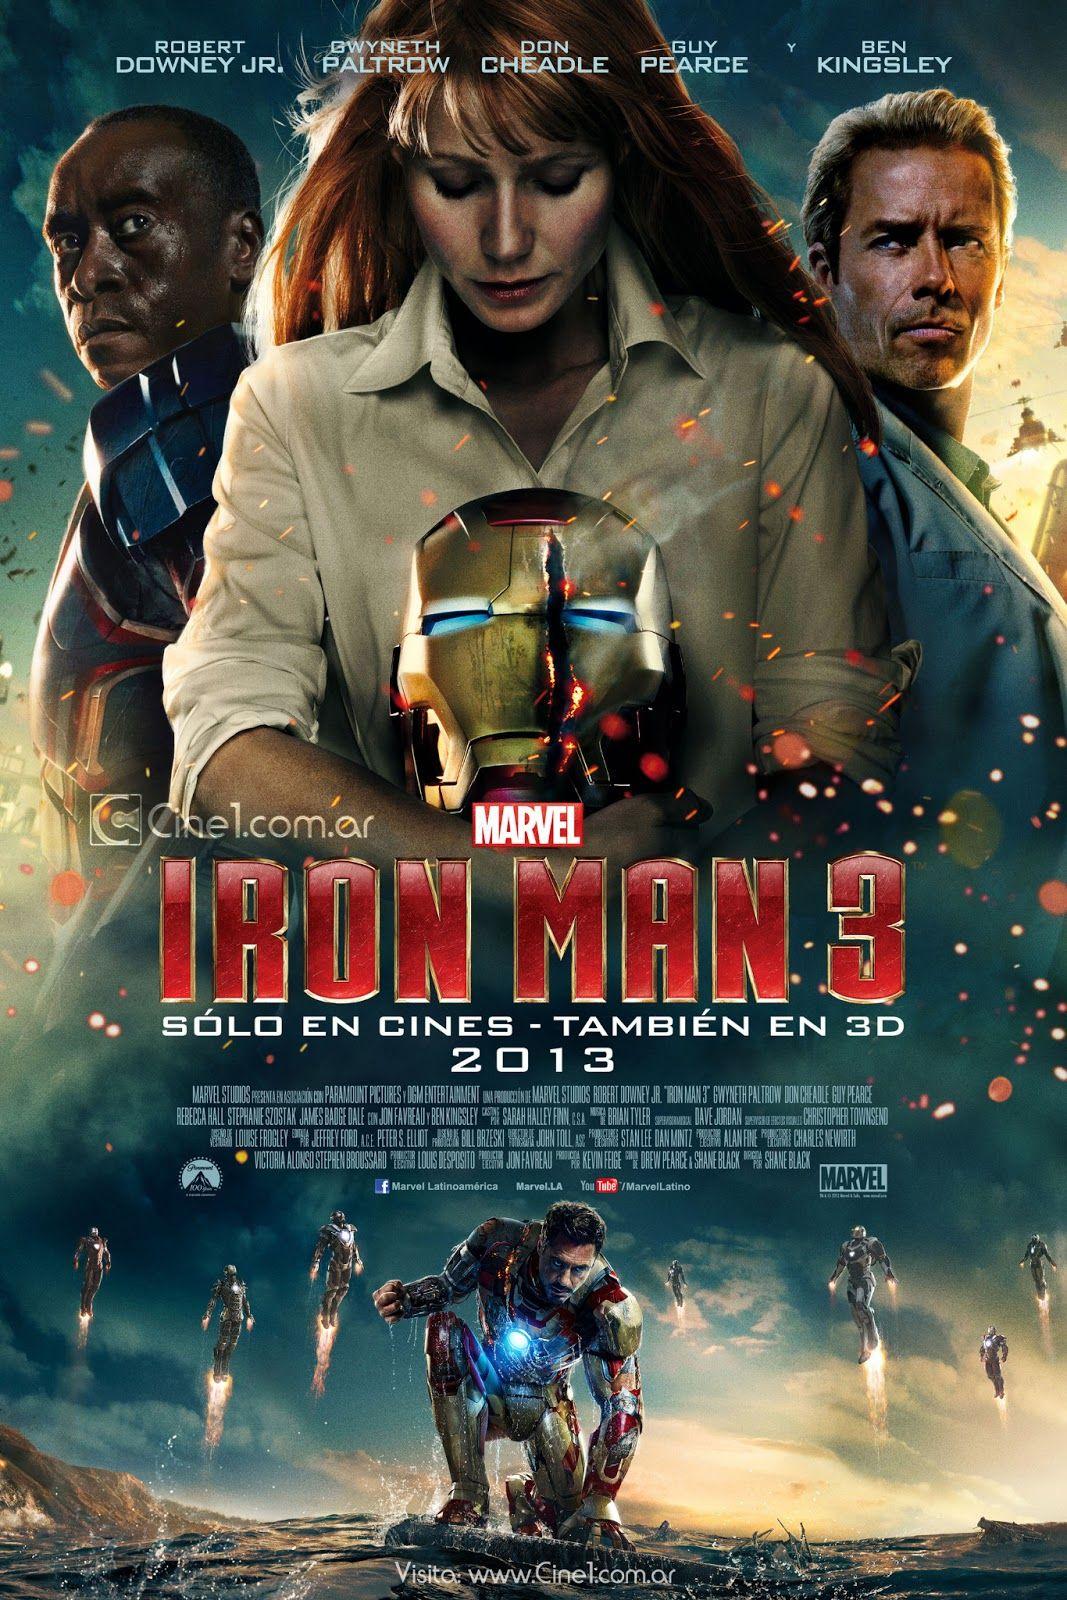 Captain America Civil War Movie Poster 24x36 Iron Man v4 - Robert Downey Jr.